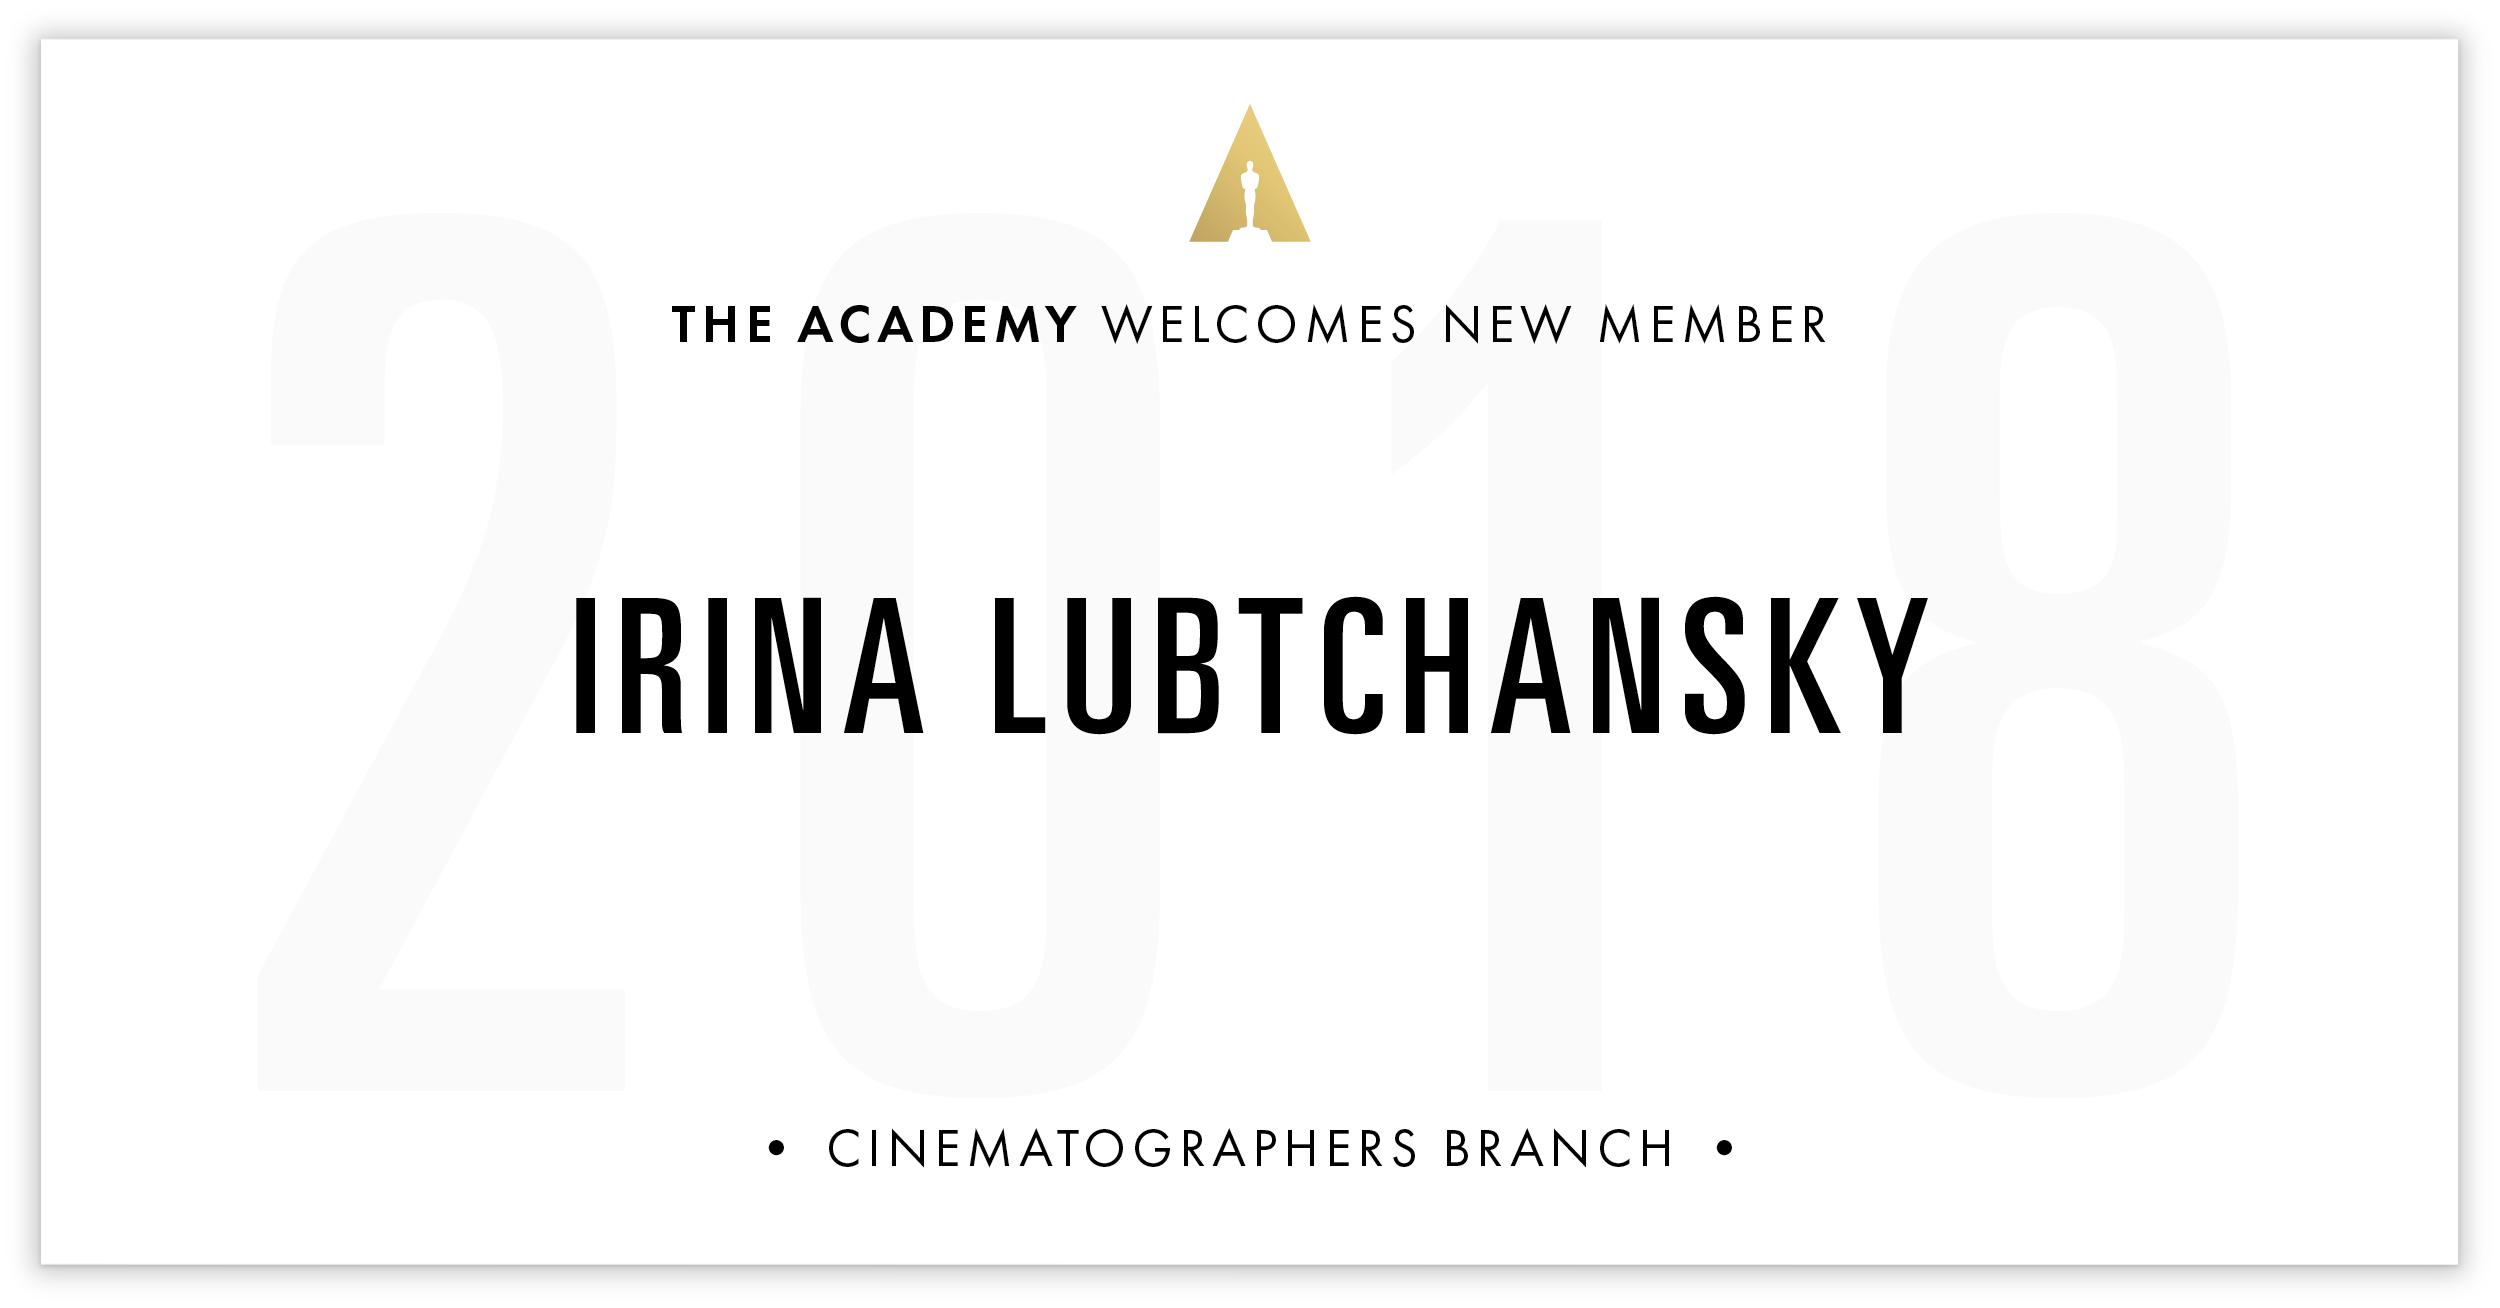 Irina Lubtchansky is invited!